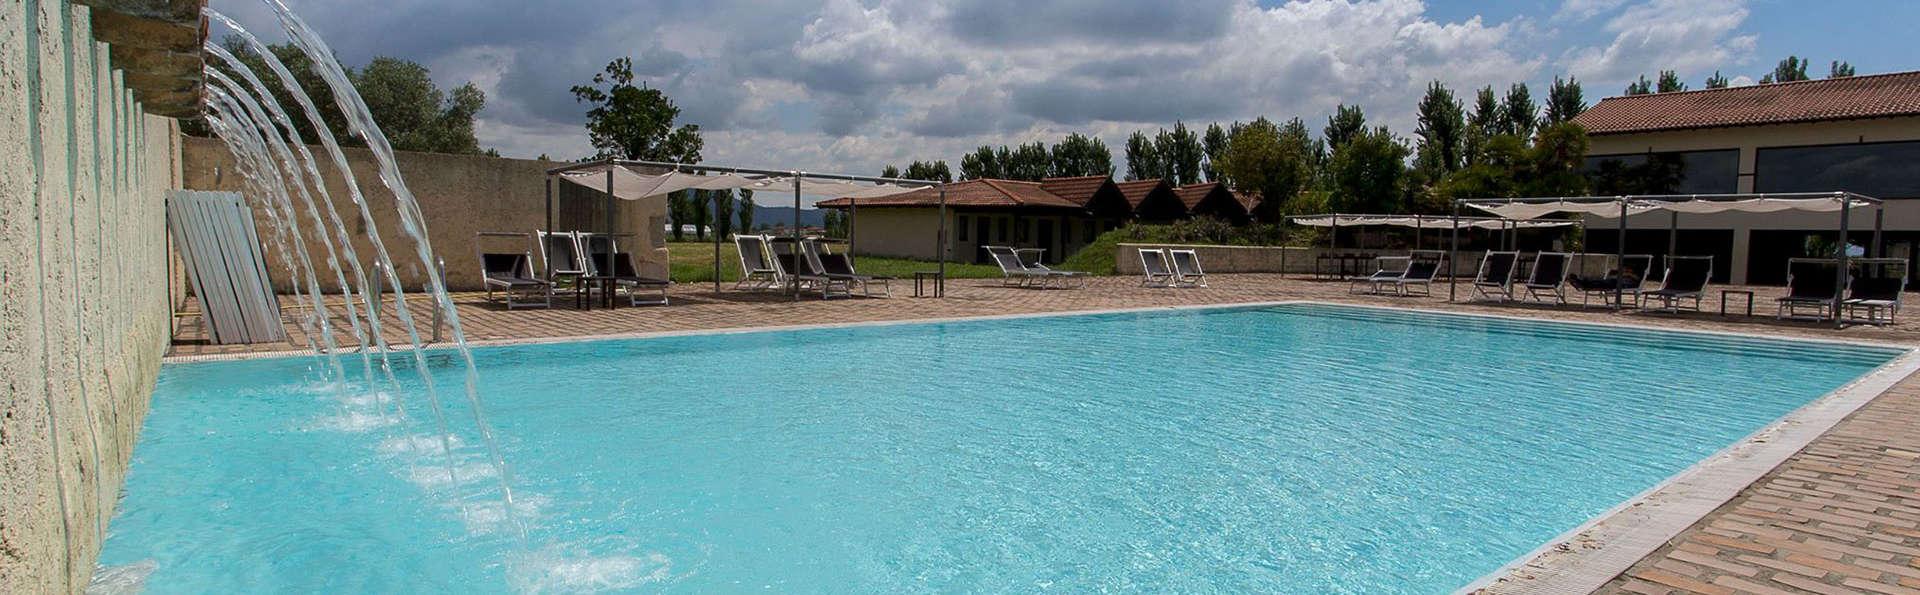 Foro Appio Mansio Hotel - EDIT_pool2.jpg